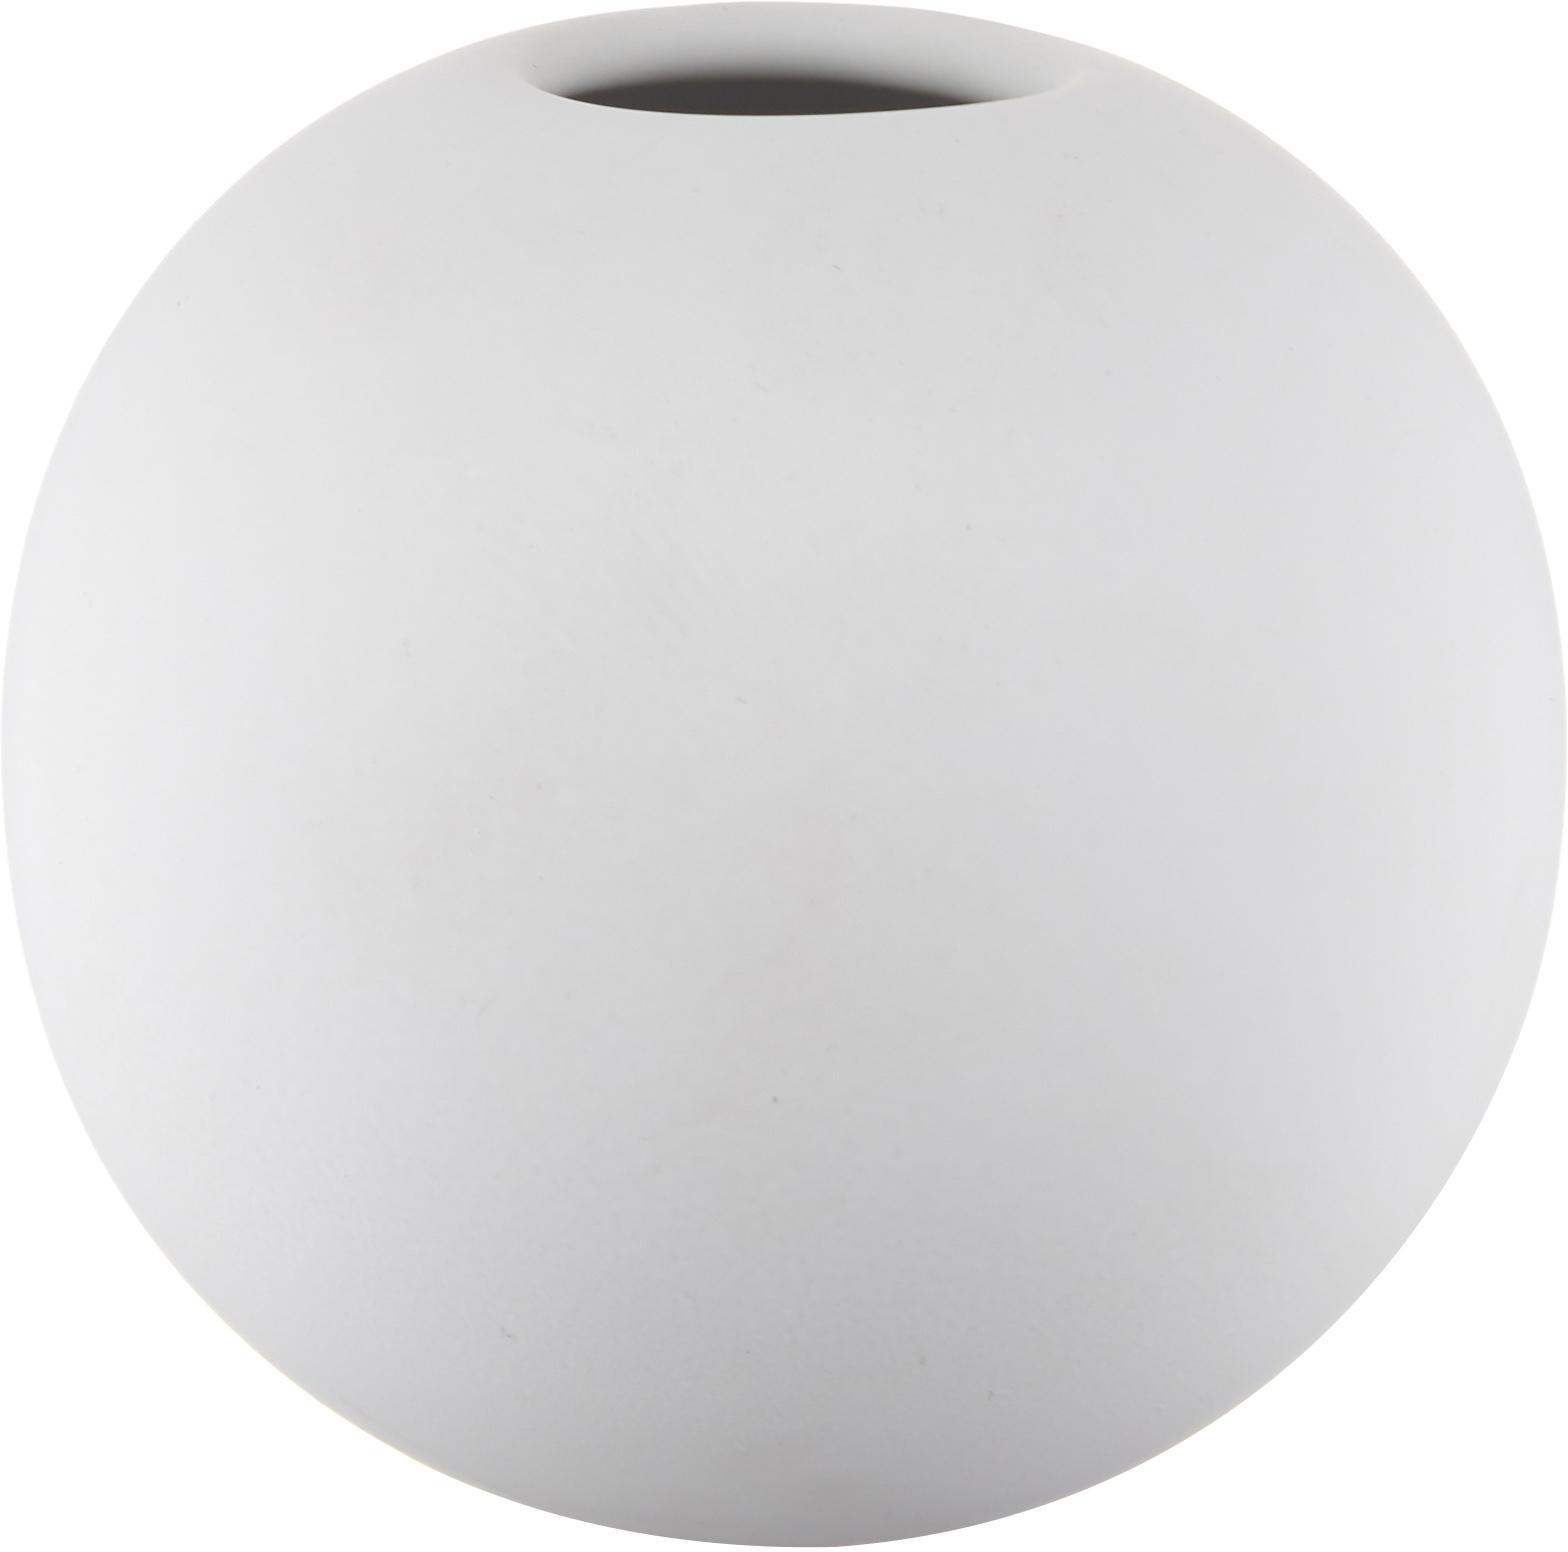 Handgefertigte Kugel-Vase Ball, Keramik, Weiß, Ø 8 x H 8 cm